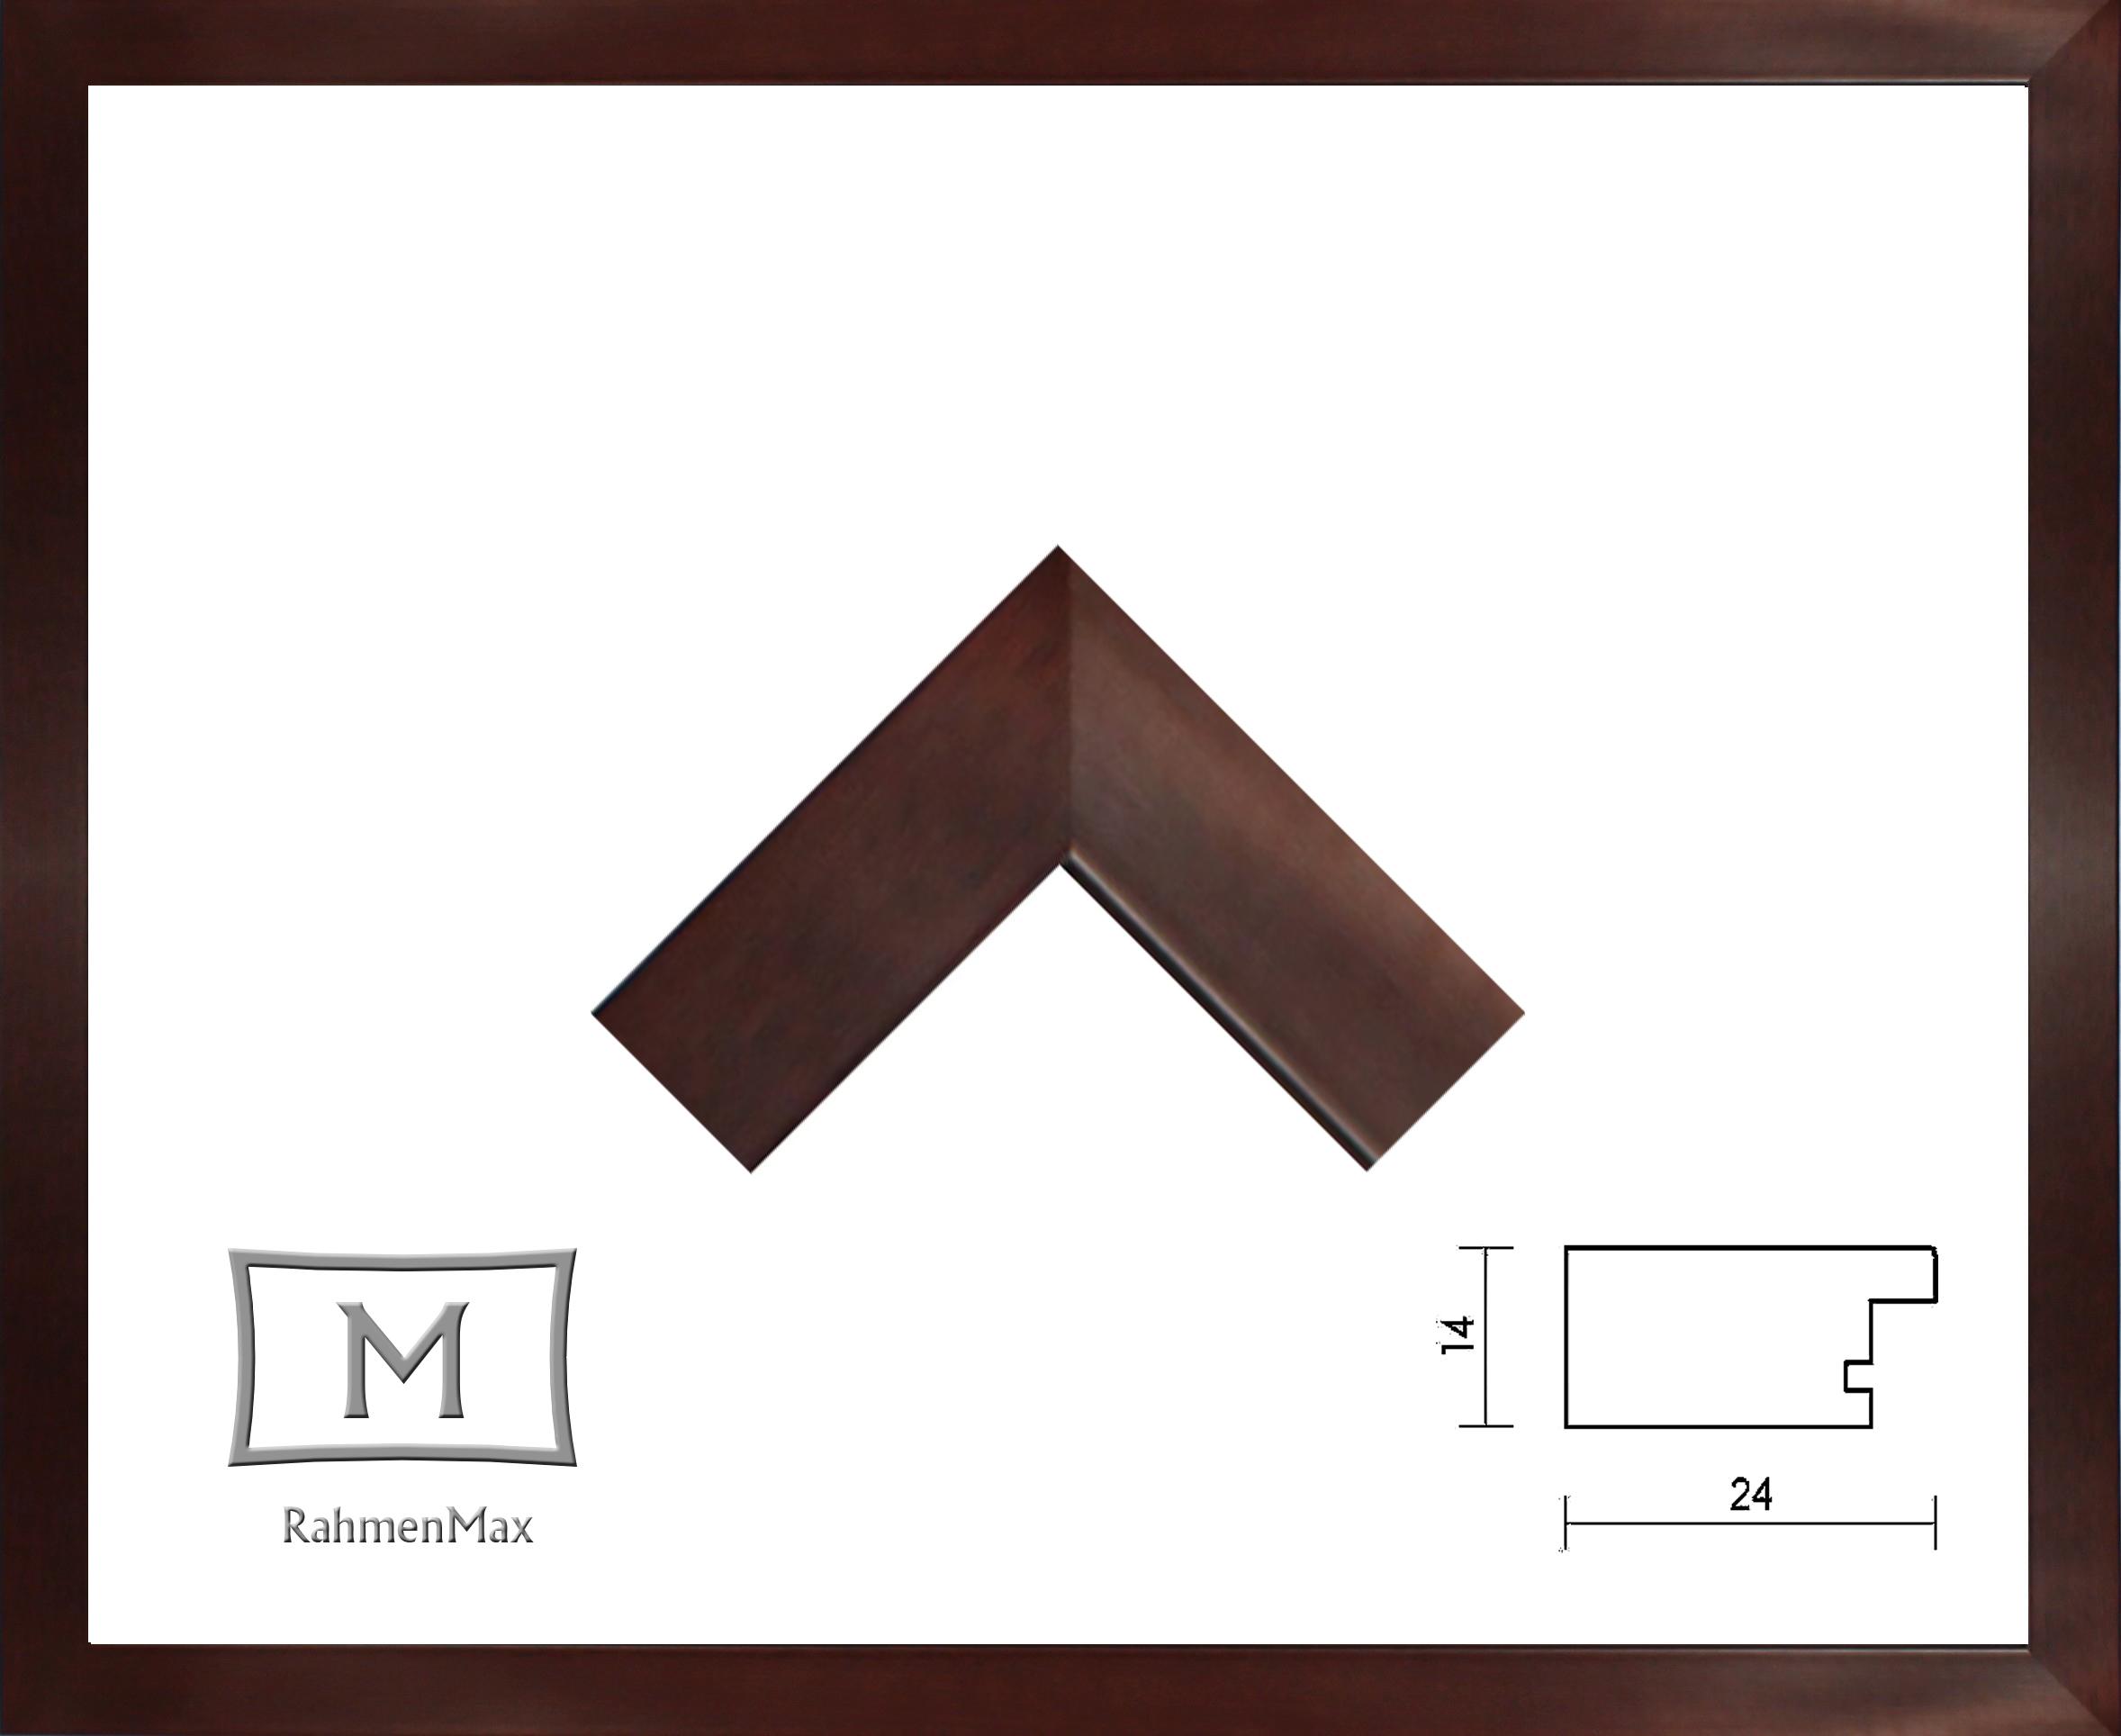 36 x 49 cm Echtholz-Bilderrahmen Jersey 49 x 36 mit Farbwahl | eBay